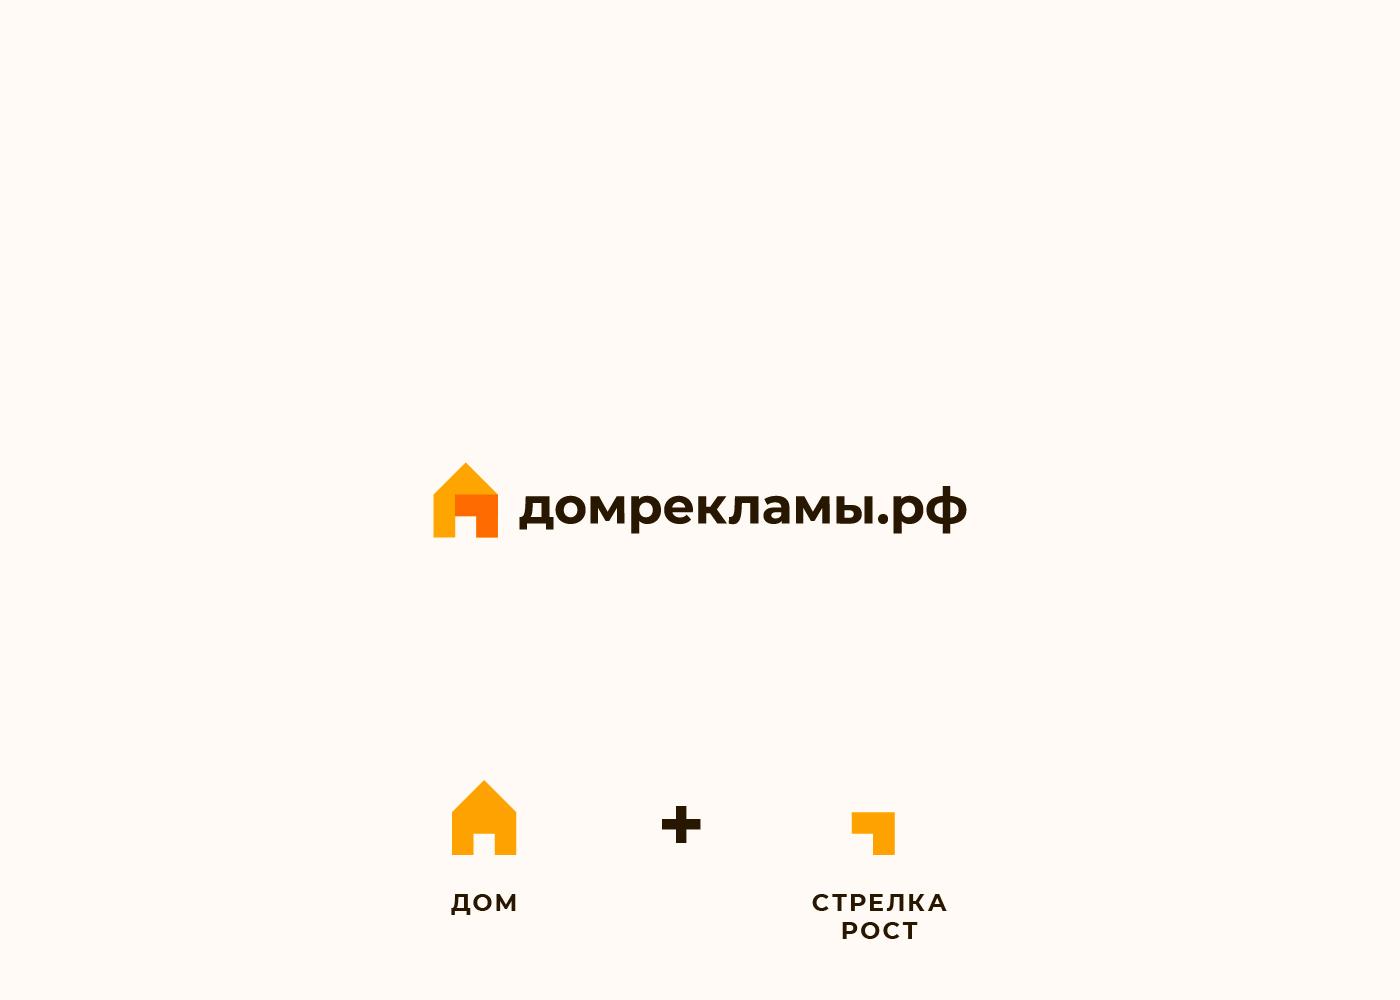 Дизайн логотипа рекламно-производственной компании фото f_0525ede7e6fe983b.jpg